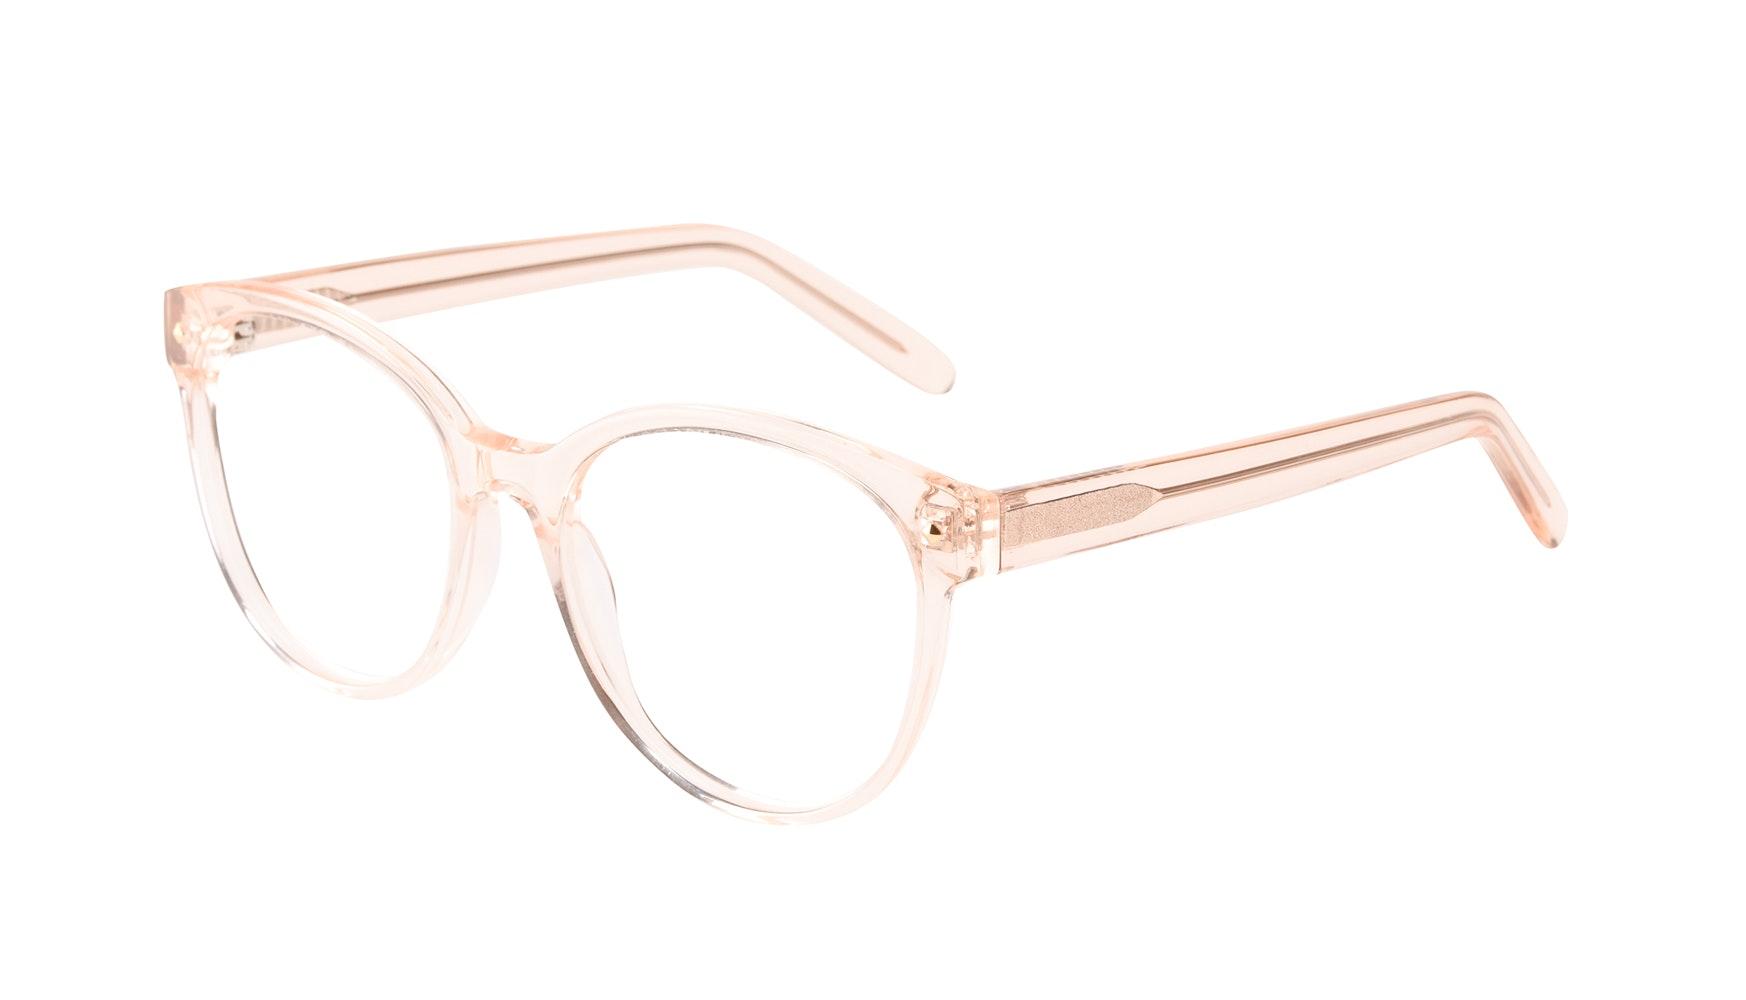 Affordable Fashion Glasses Round Eyeglasses Women Eclipse Blond Tilt